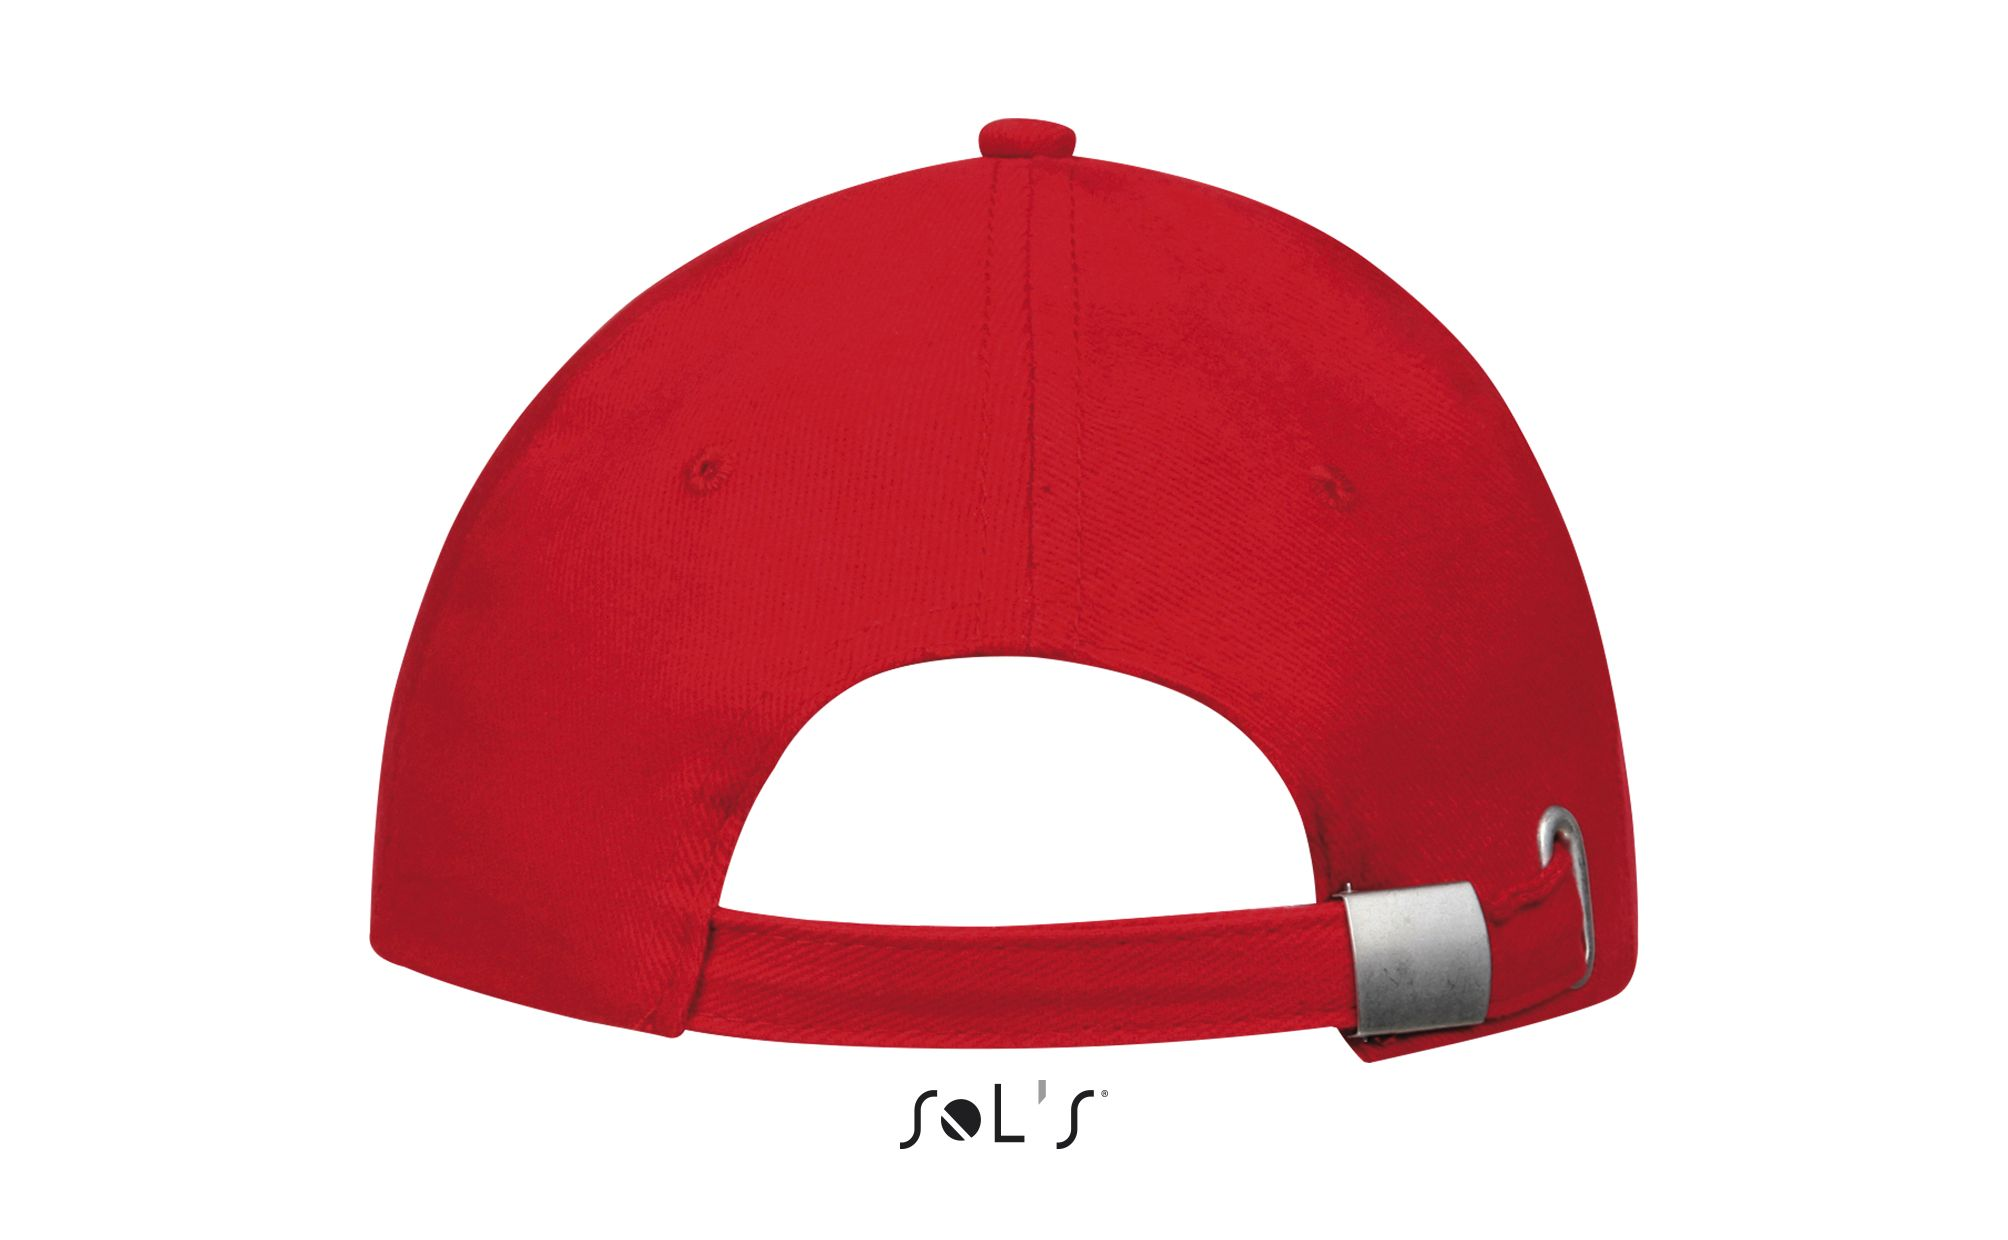 908 - Red / White